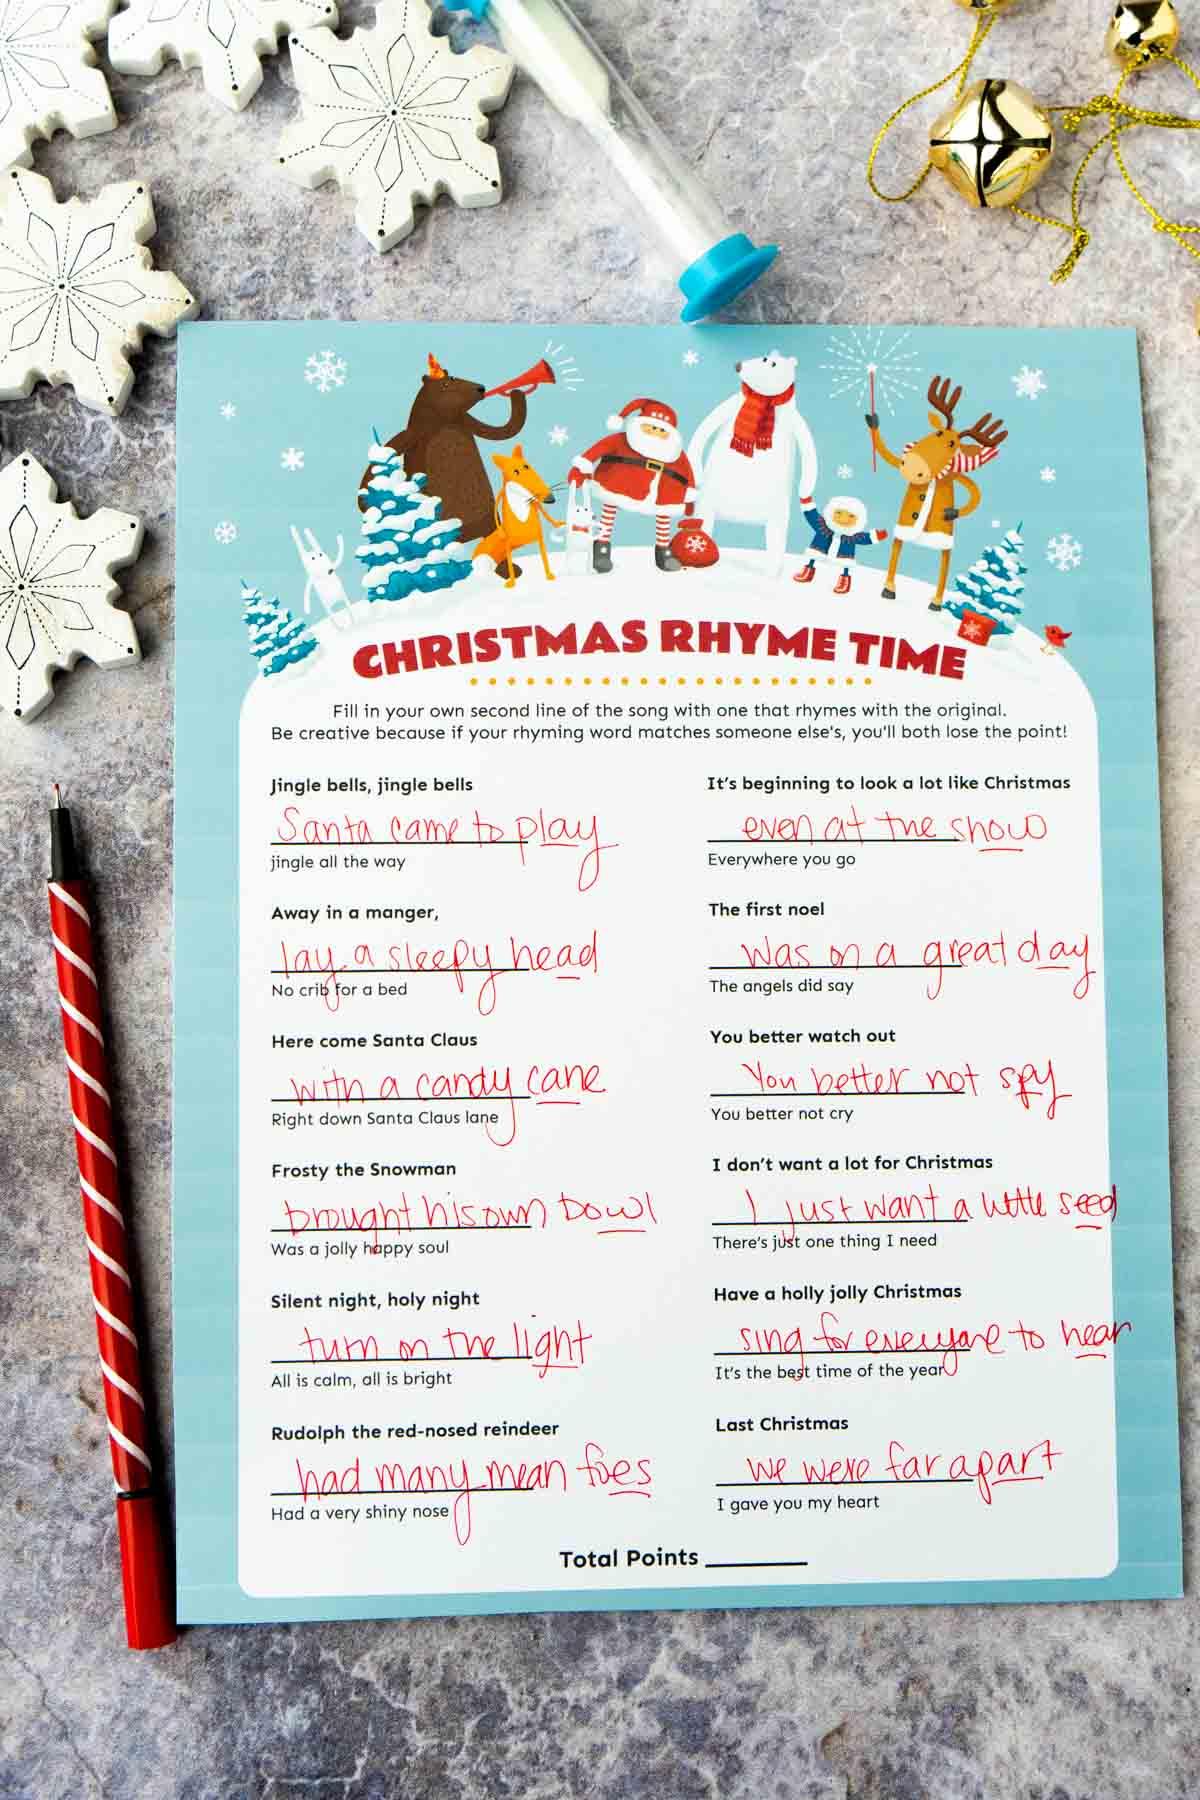 Christmas rhyme game with lyrics written on it